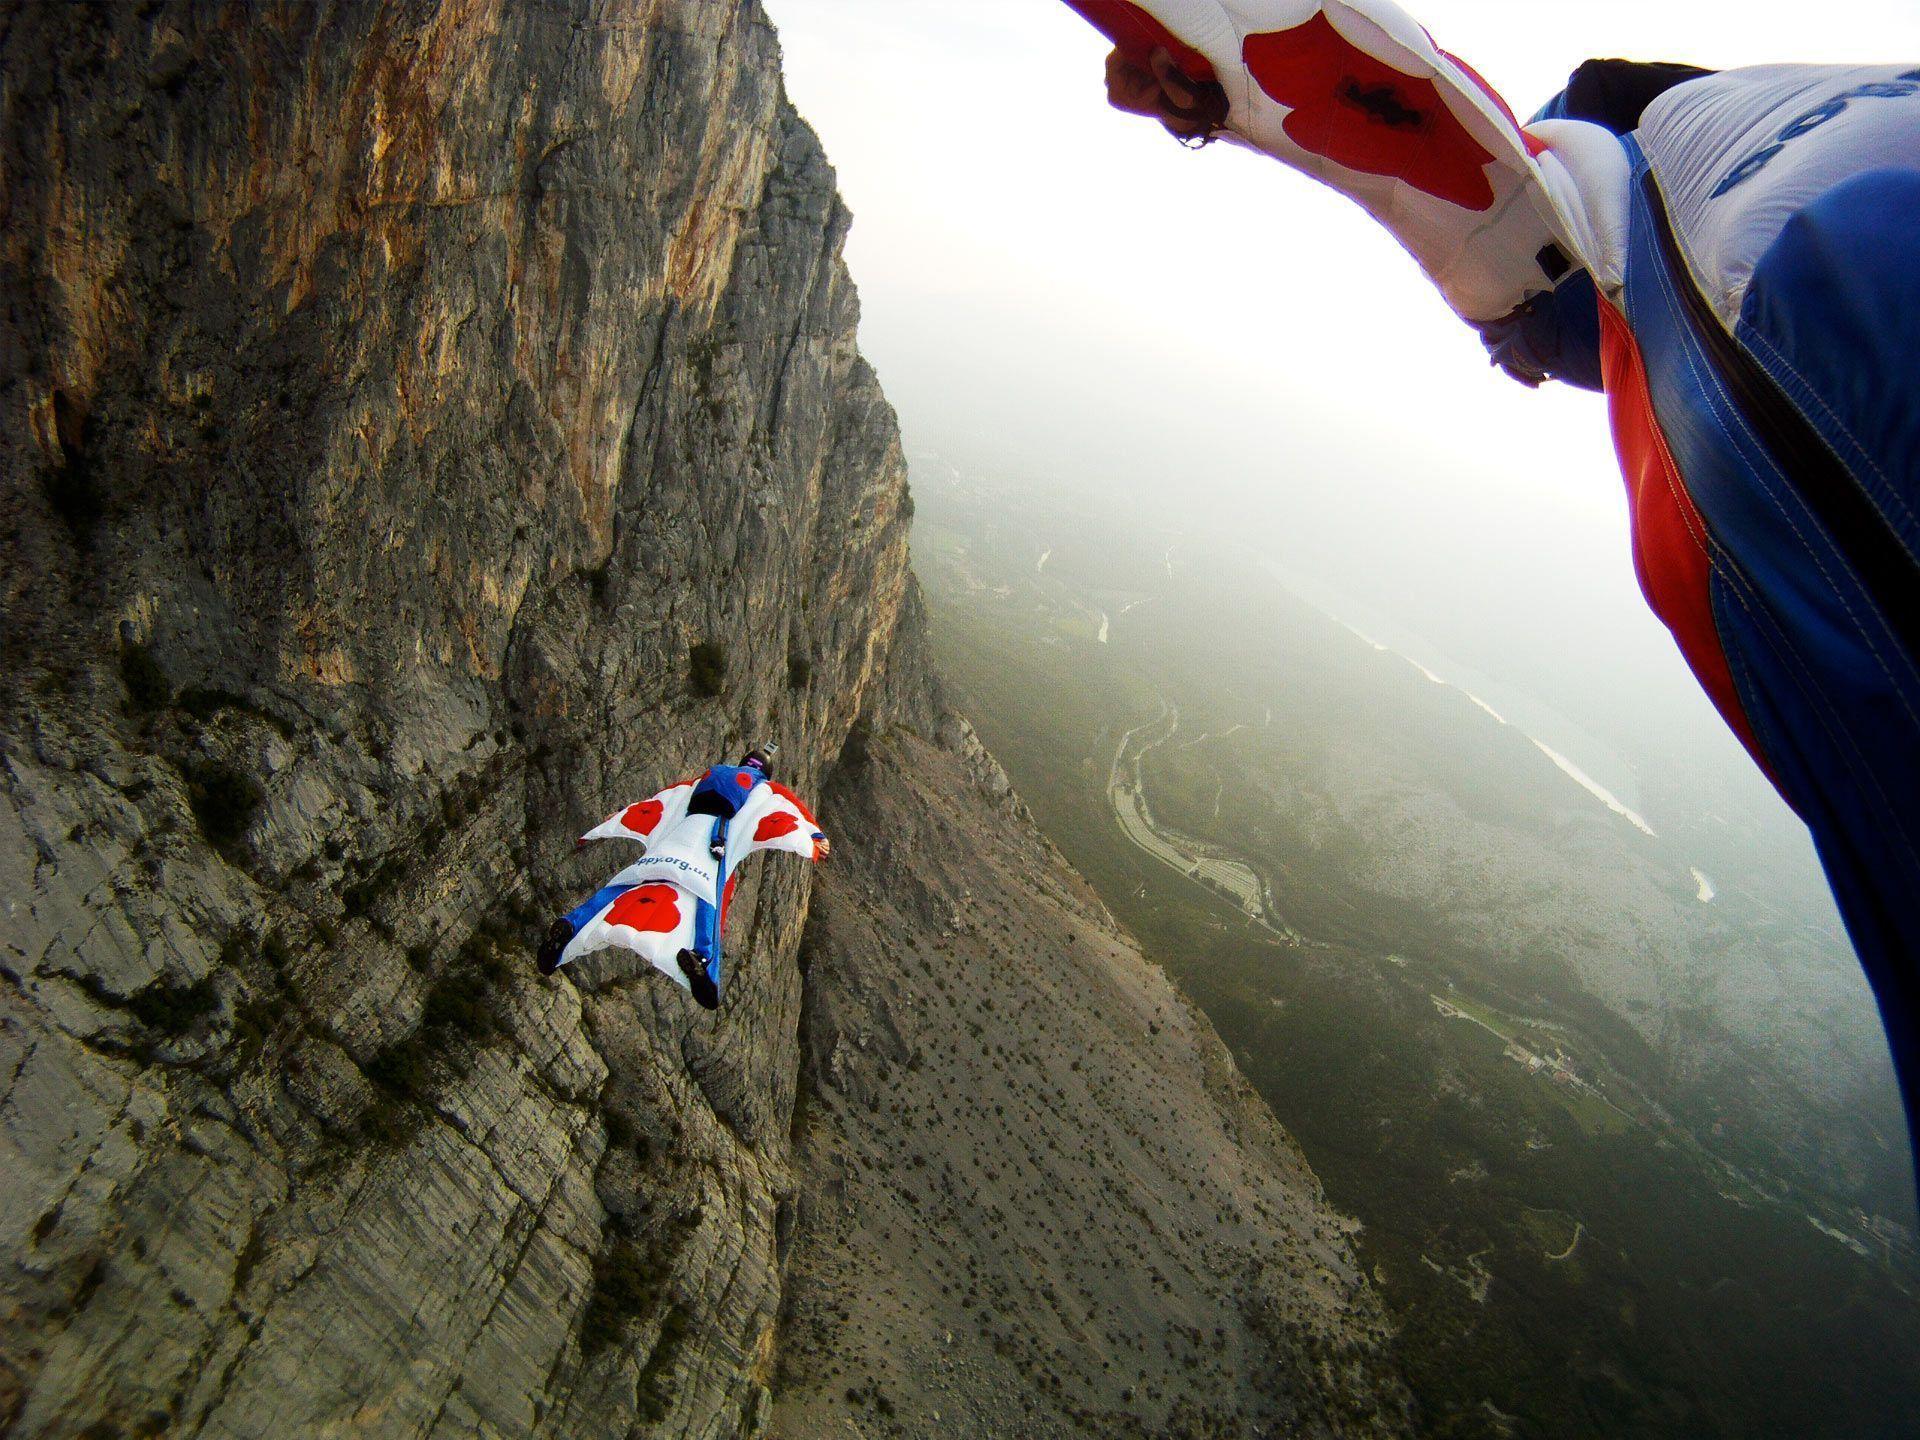 Paragliding Wallpaper Hd Wingsuit Wallpapers Wallpaper Cave